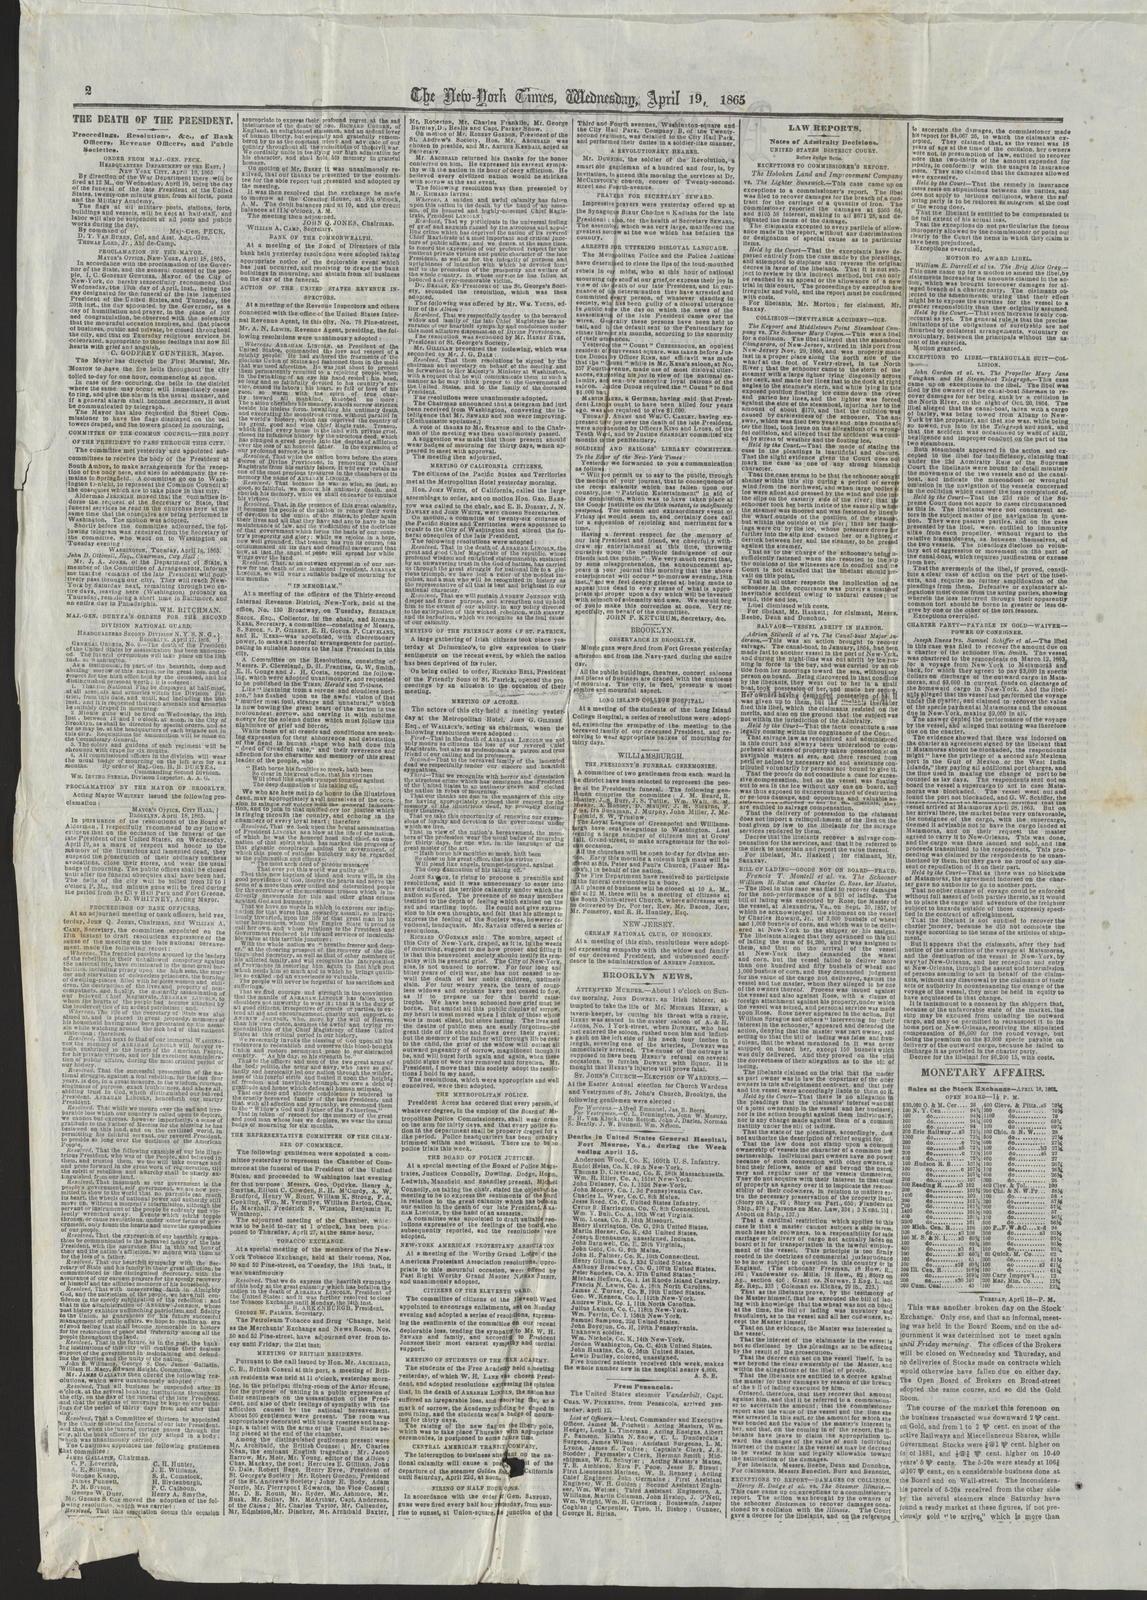 New York Times, [newspaper]. April 19, 1865.